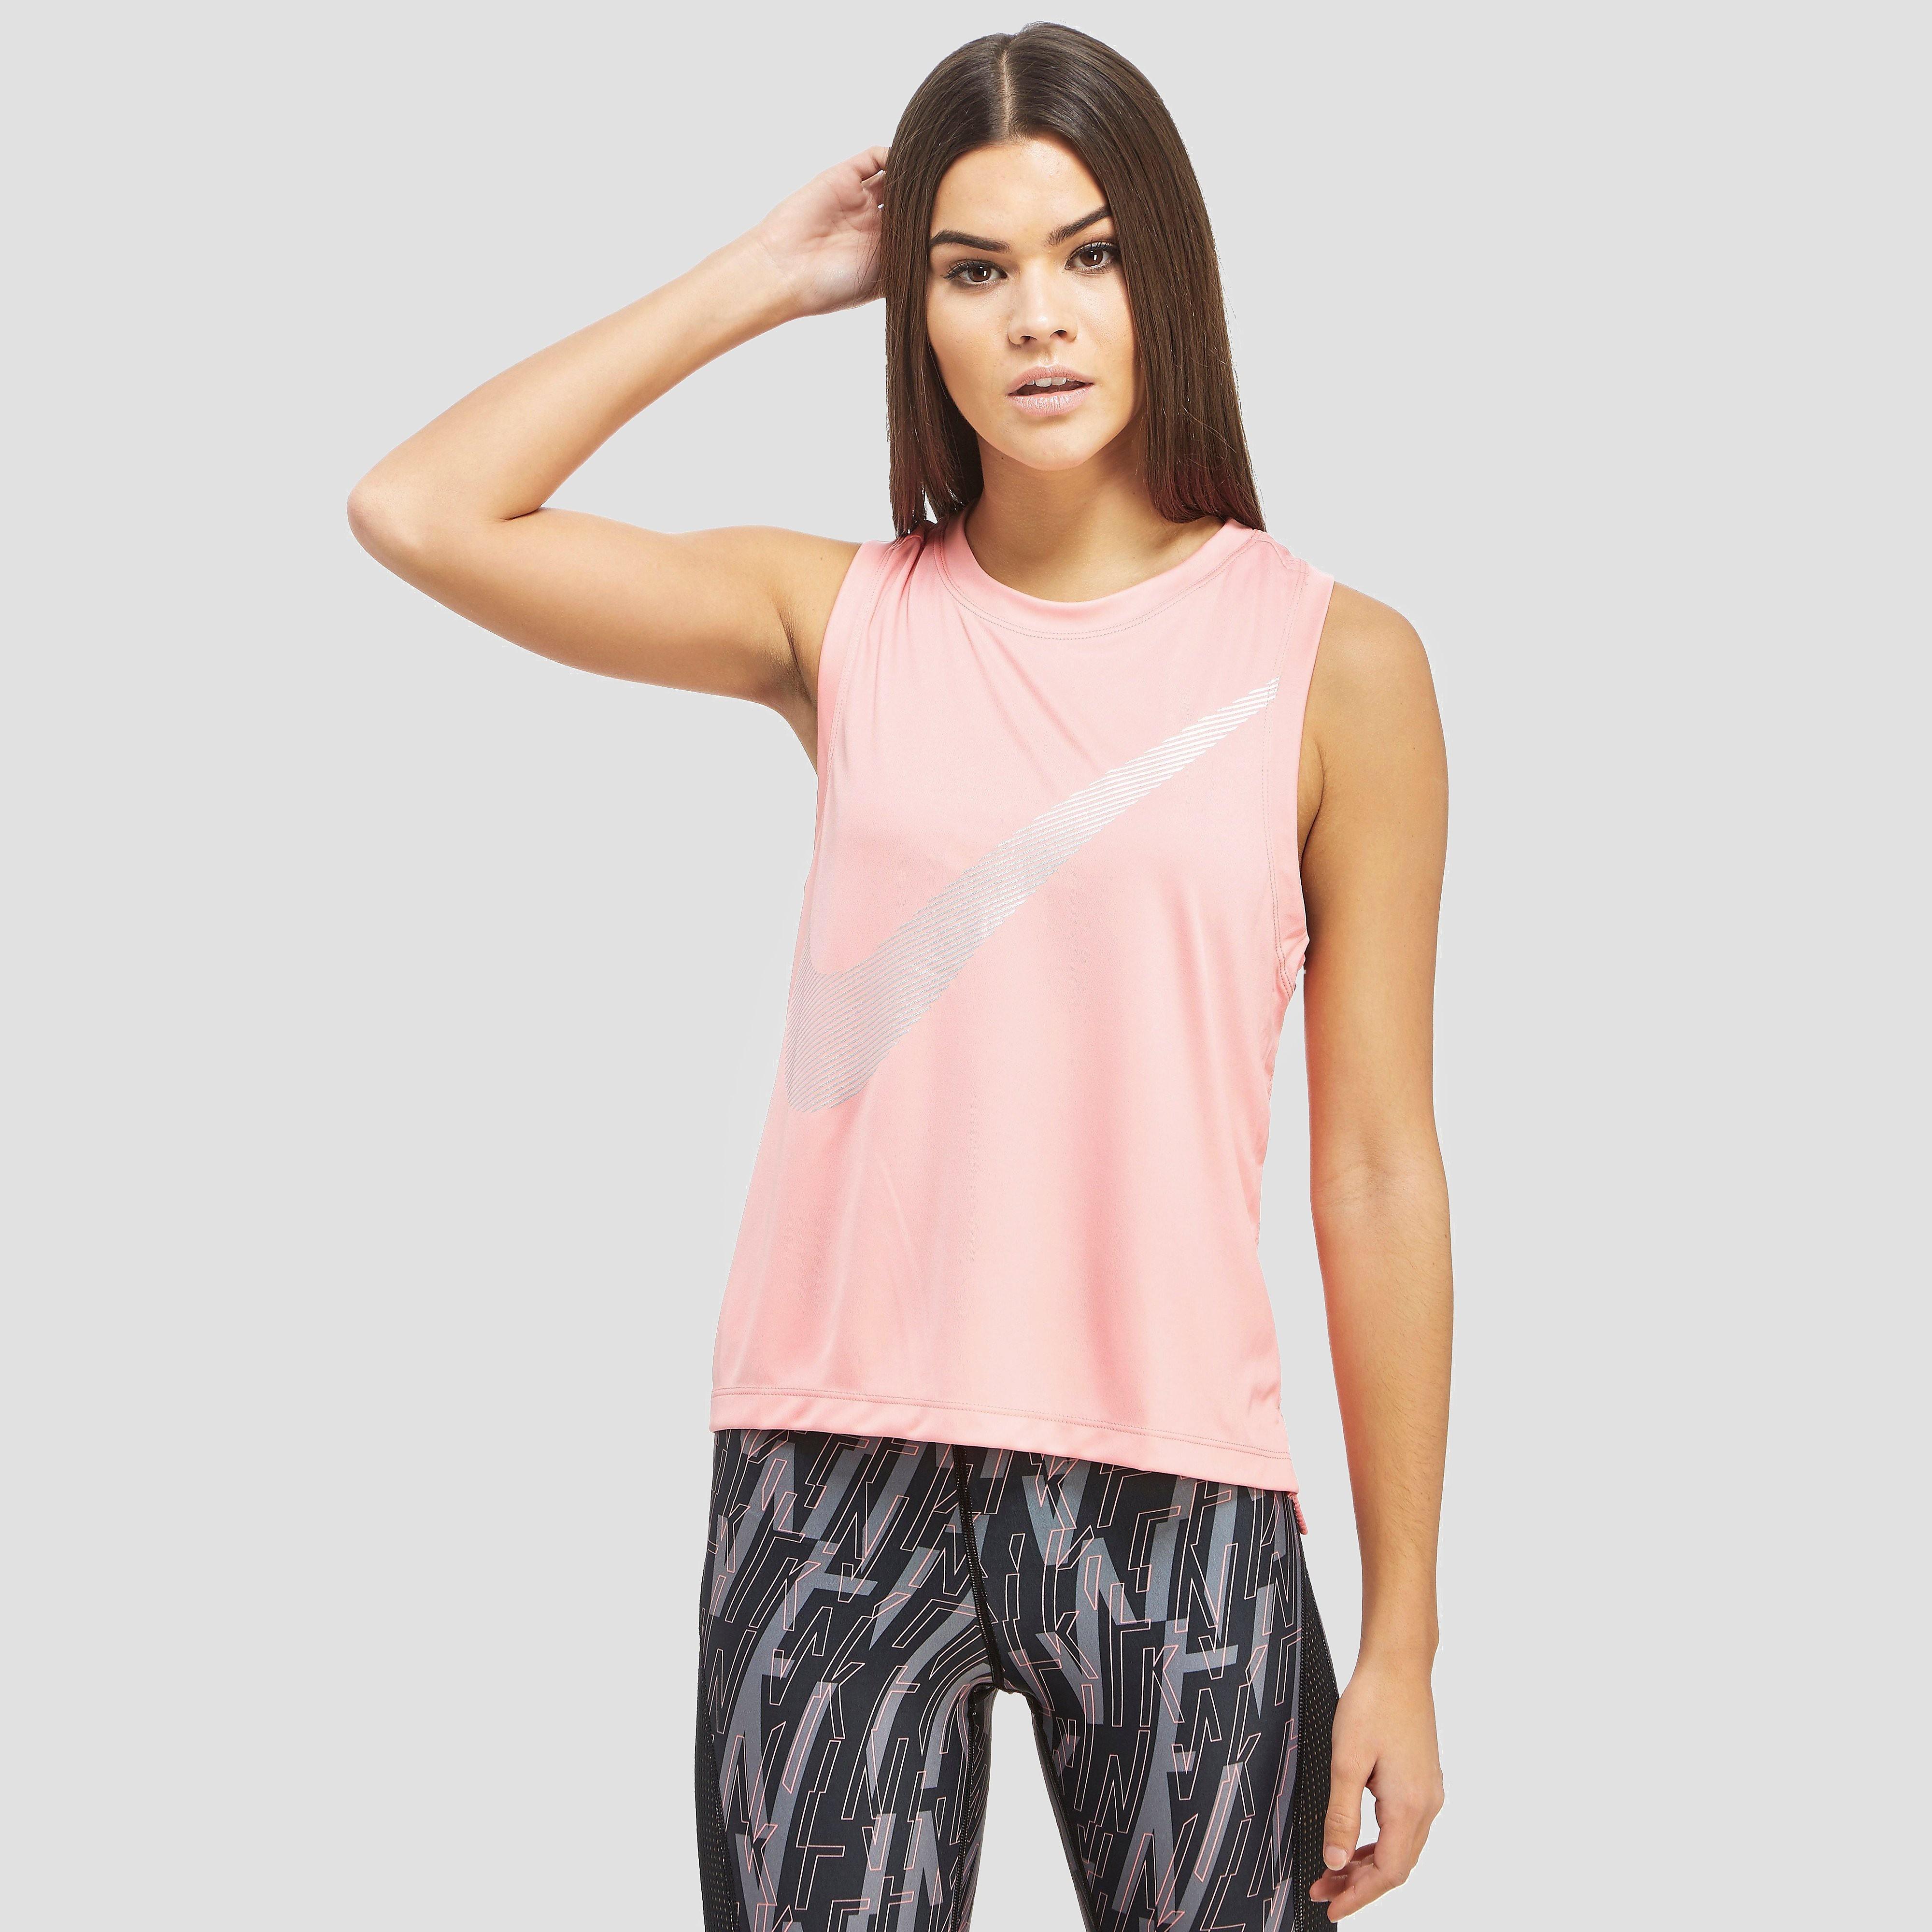 Nike Dry Women's Tank Top